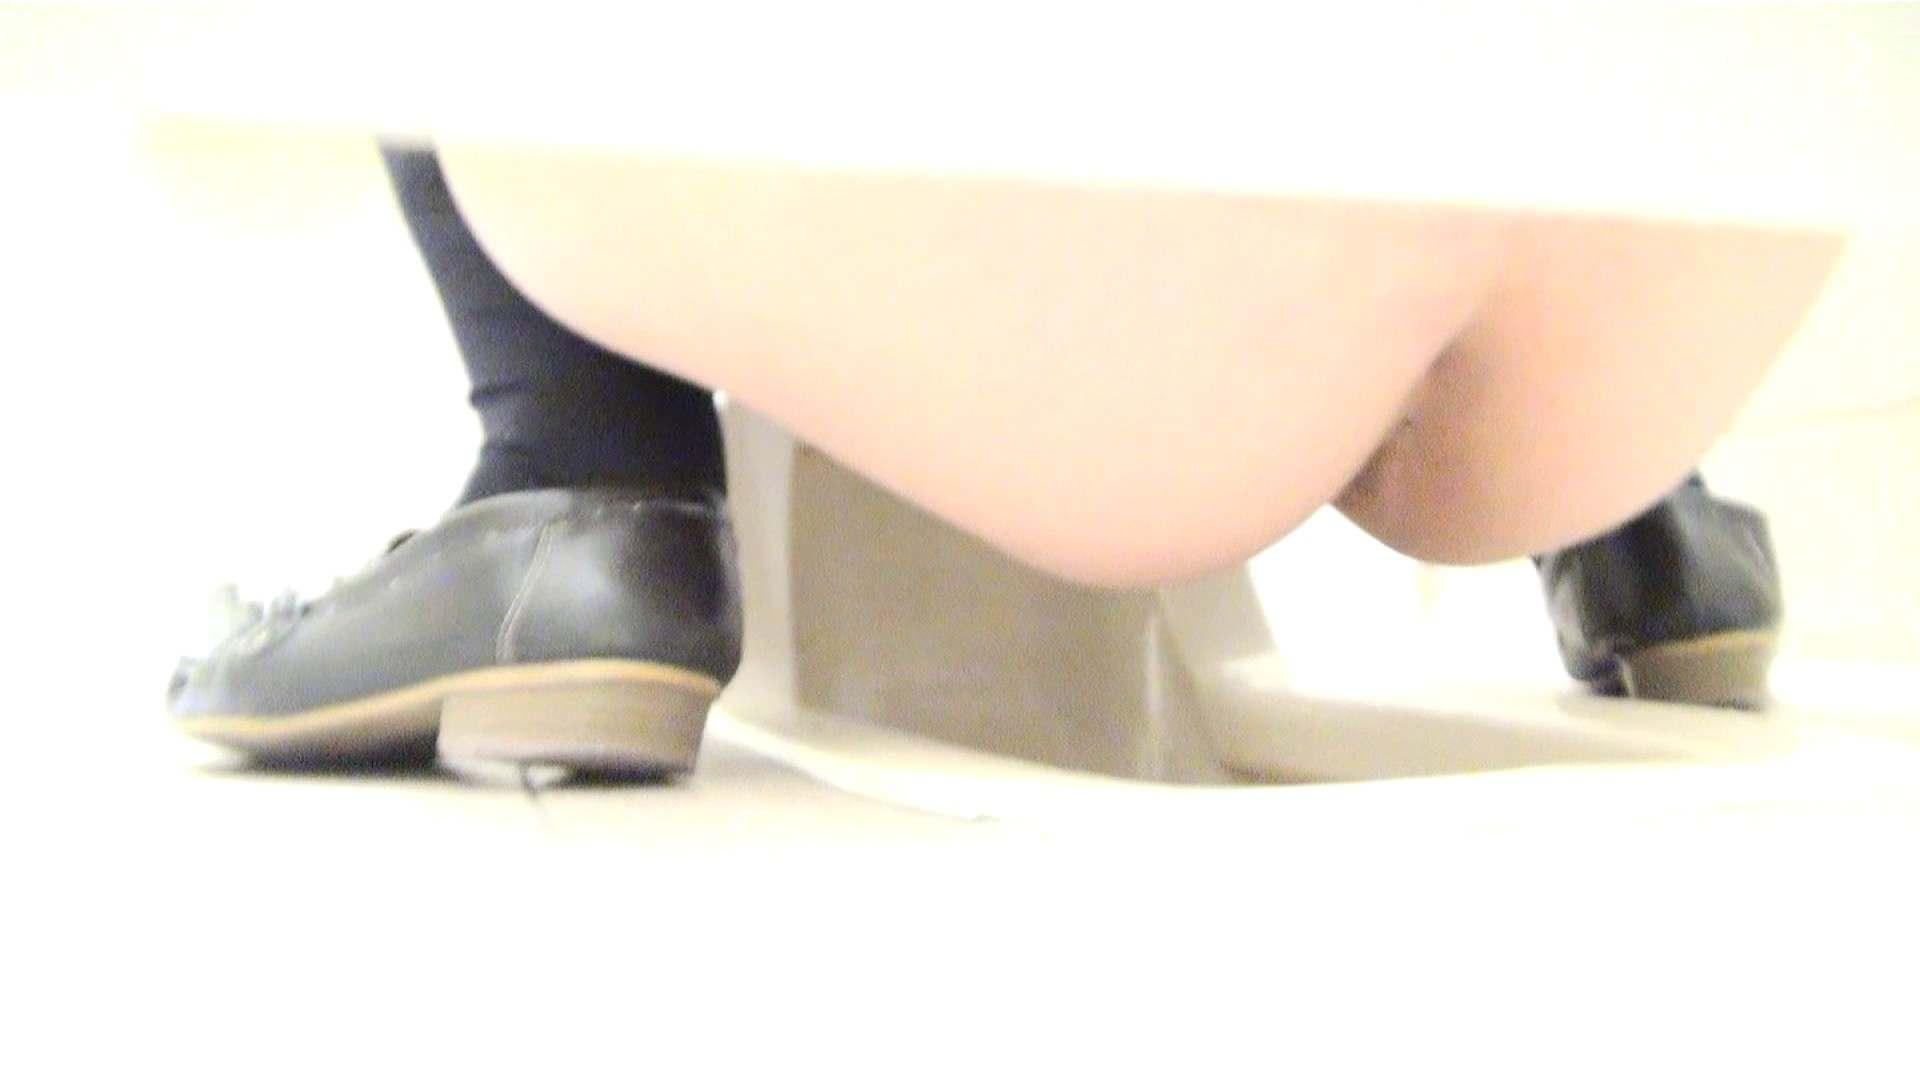 至高下半身盗撮-PREMIUM-【院内病棟編 】 vol.03 洗面所 AV無料動画キャプチャ 98連発 7